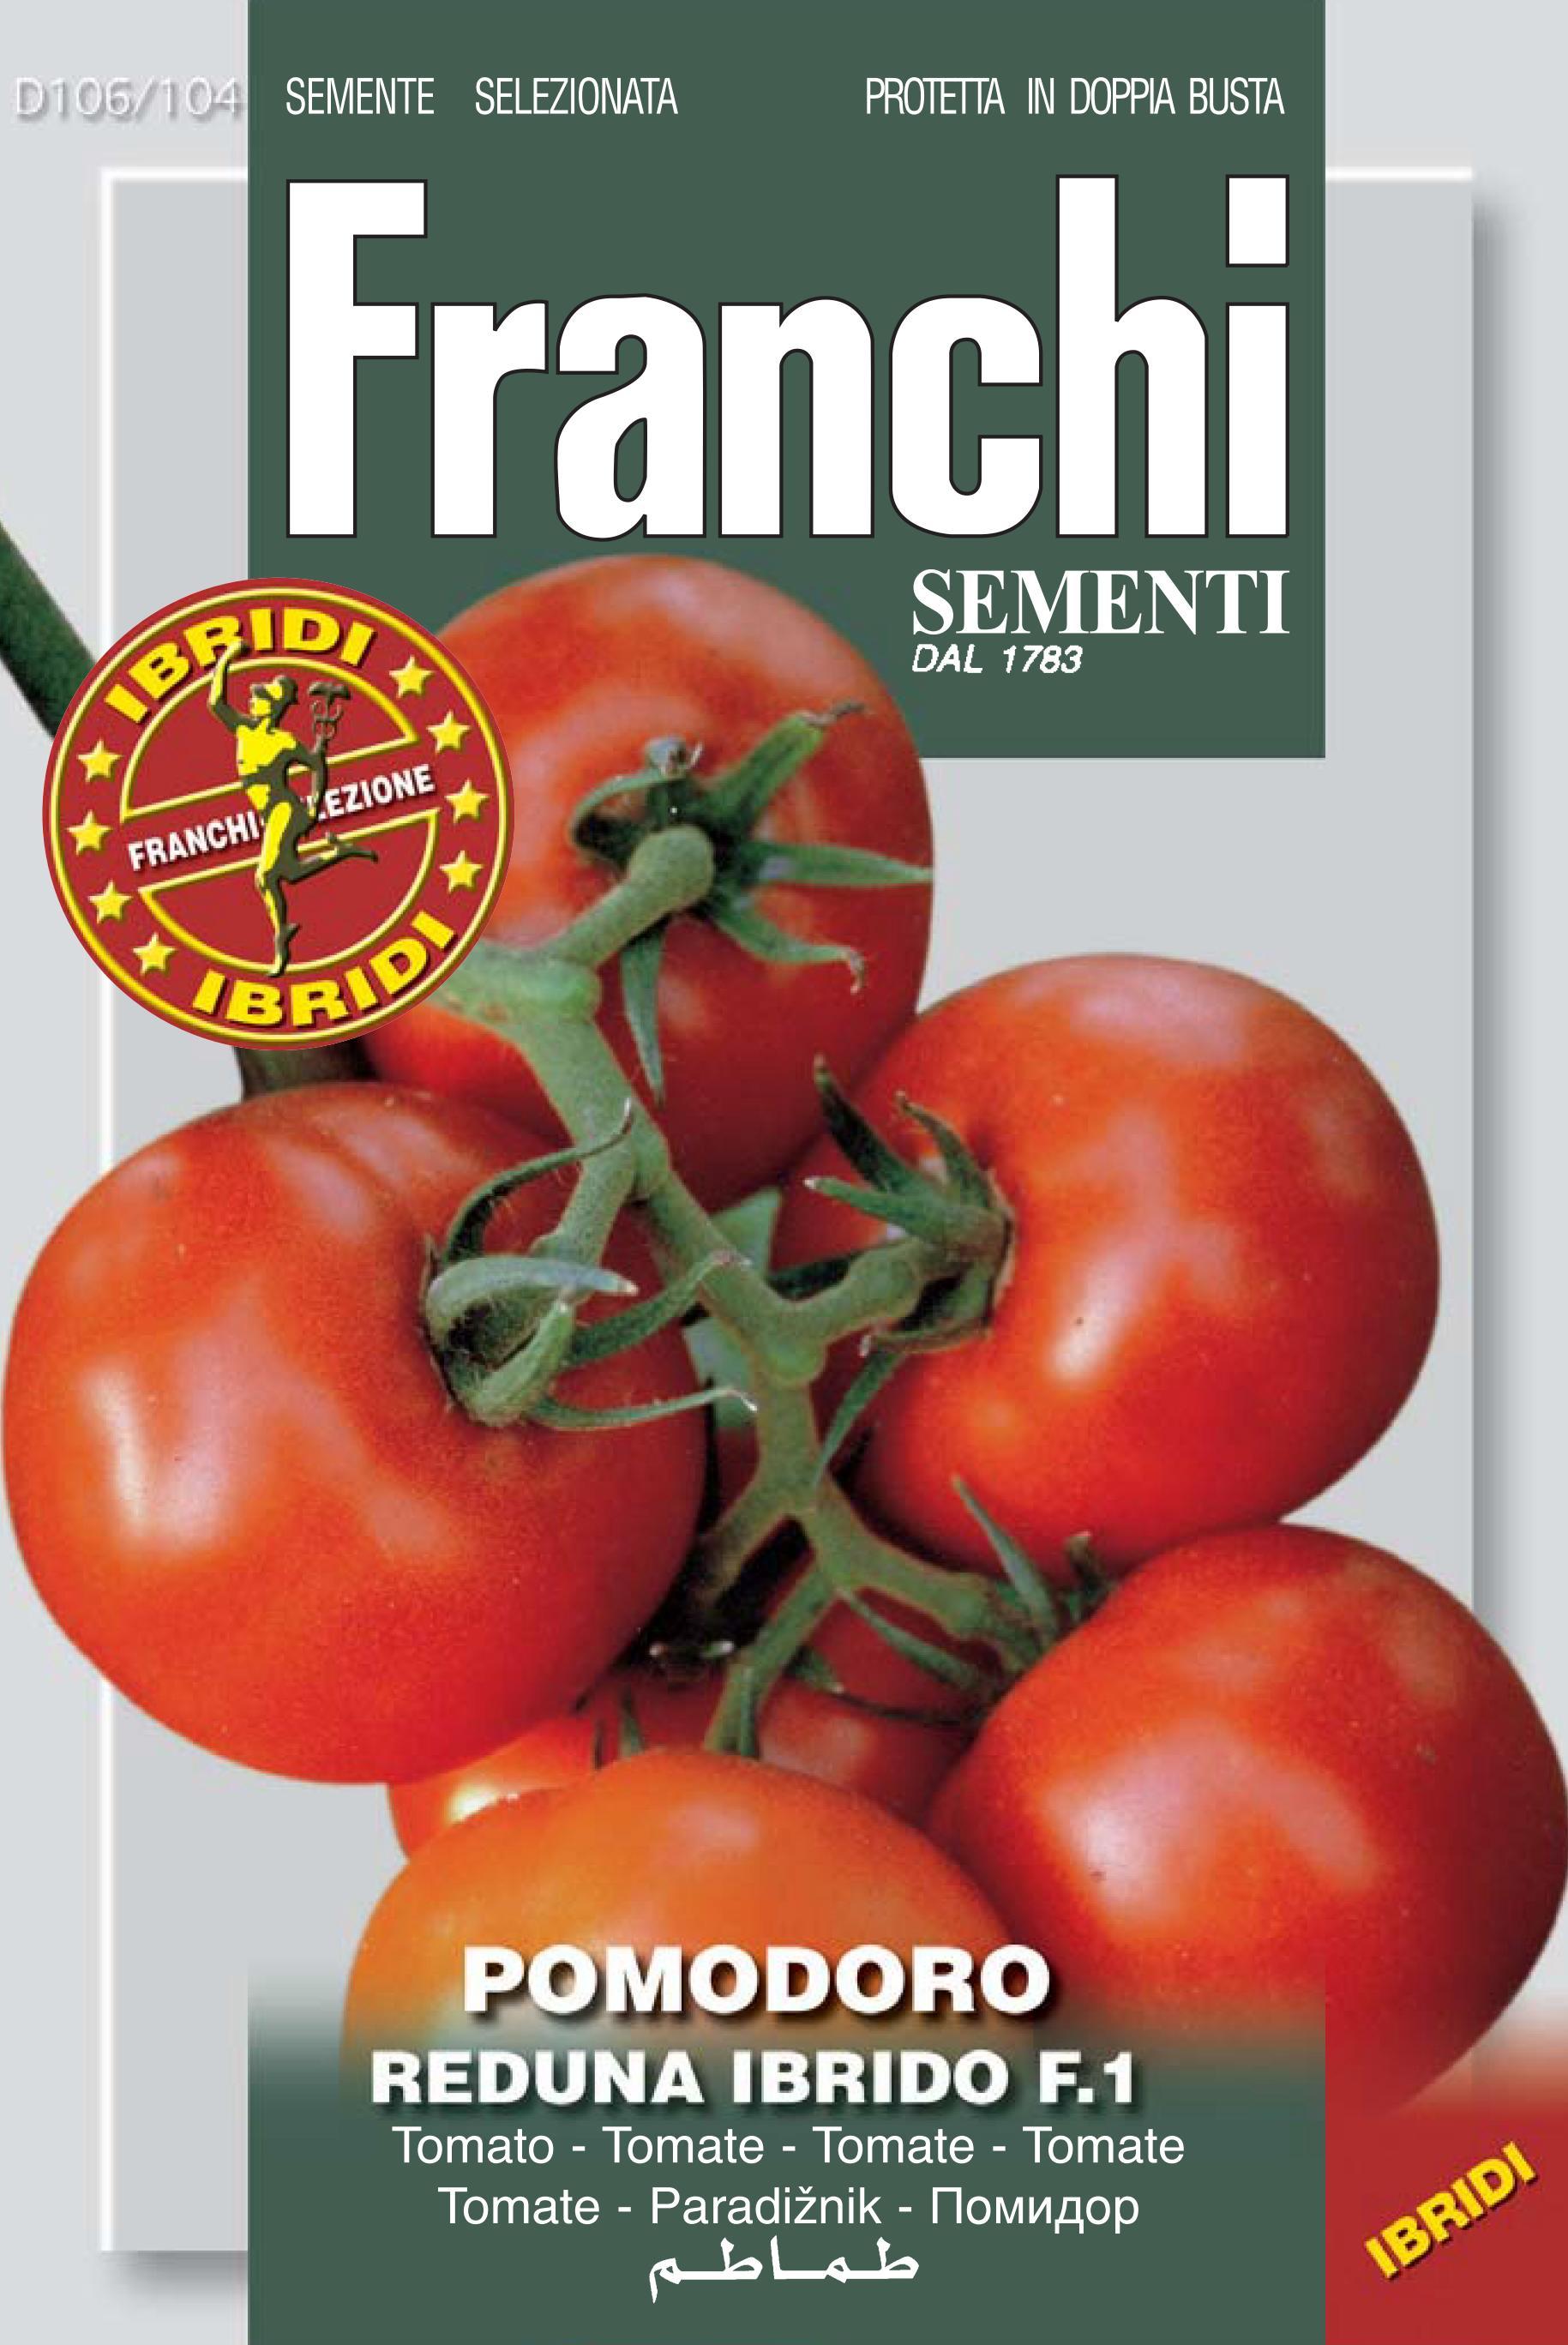 Tomato Reduna F1 (A) Solanum Lycopersicum L.